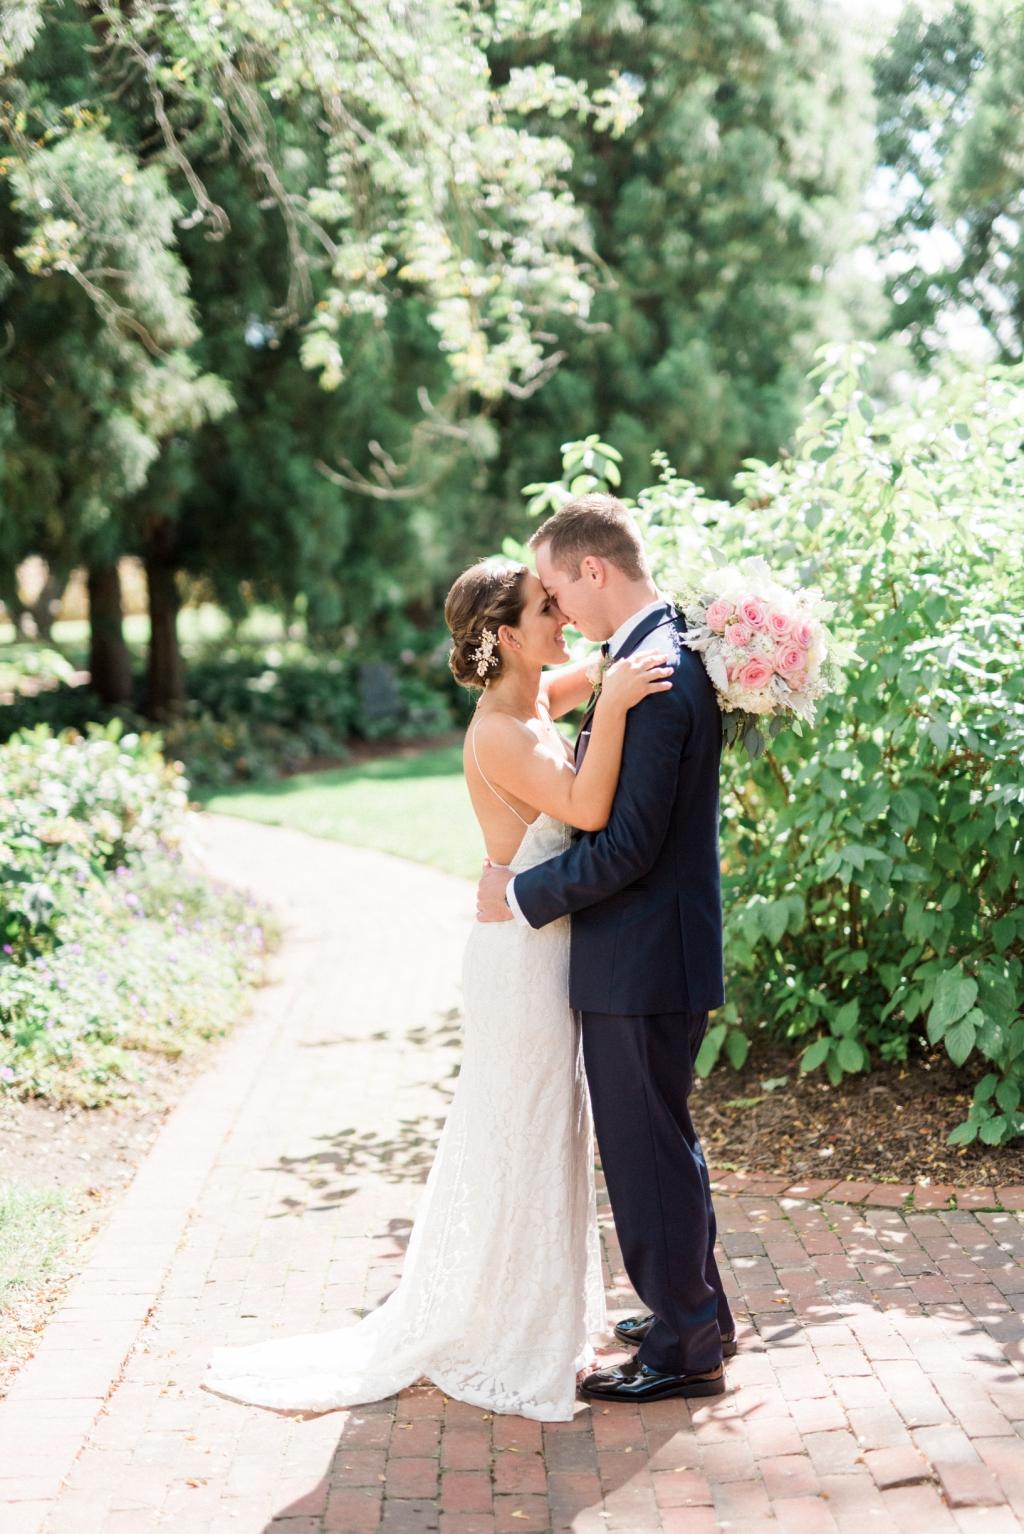 haley-richter-photography-buena-vista-confrence-center-wedding-summer-040